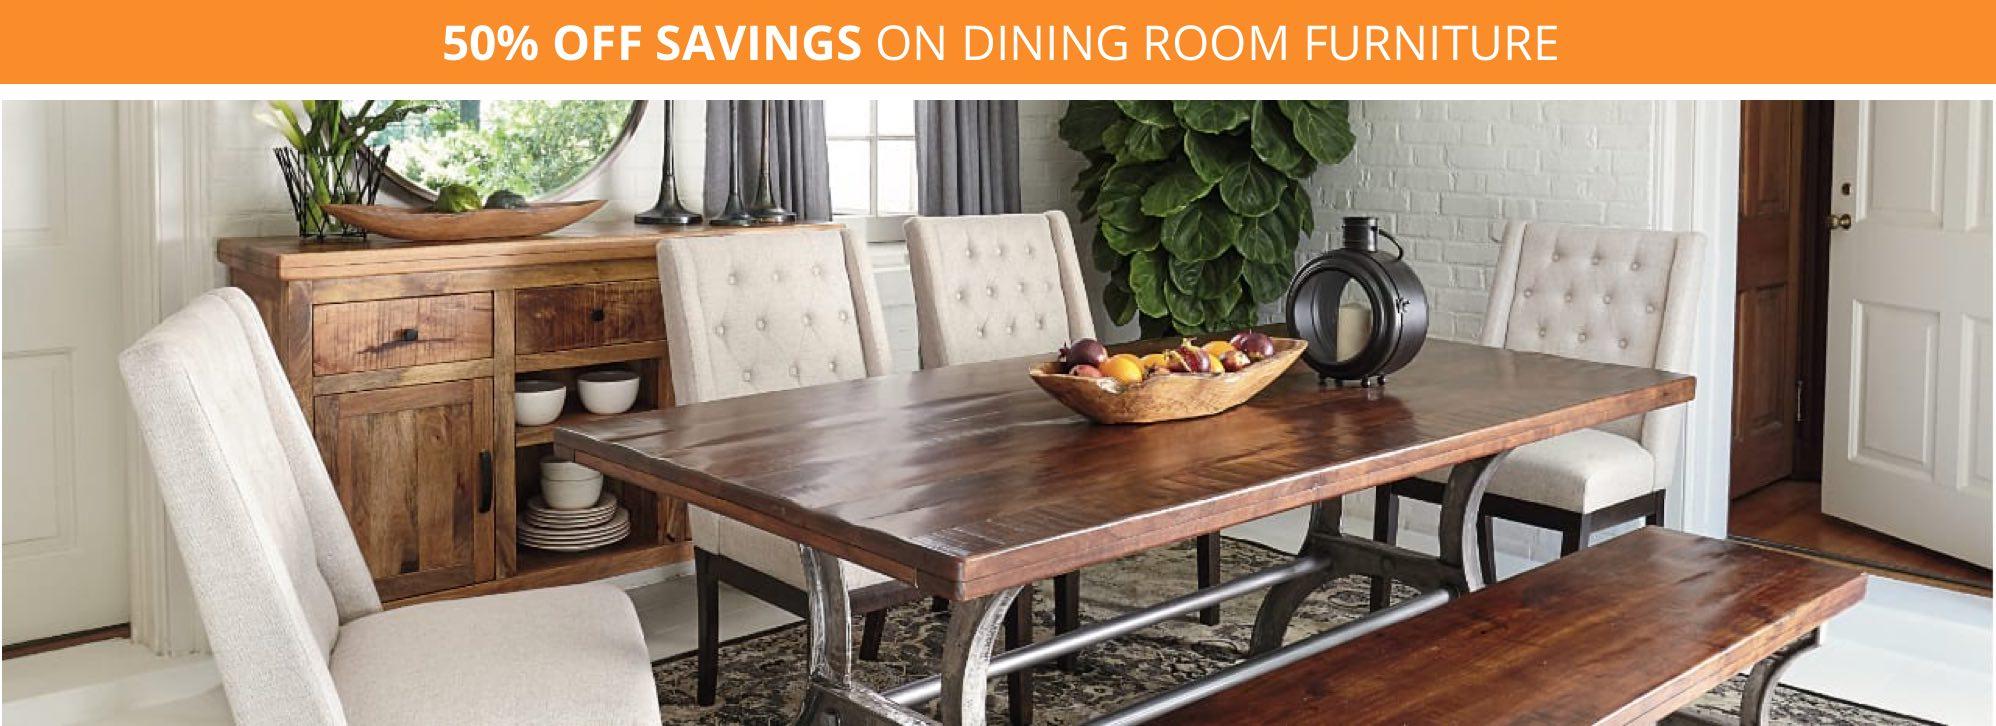 50% Off Savings On Dining Room Furniture